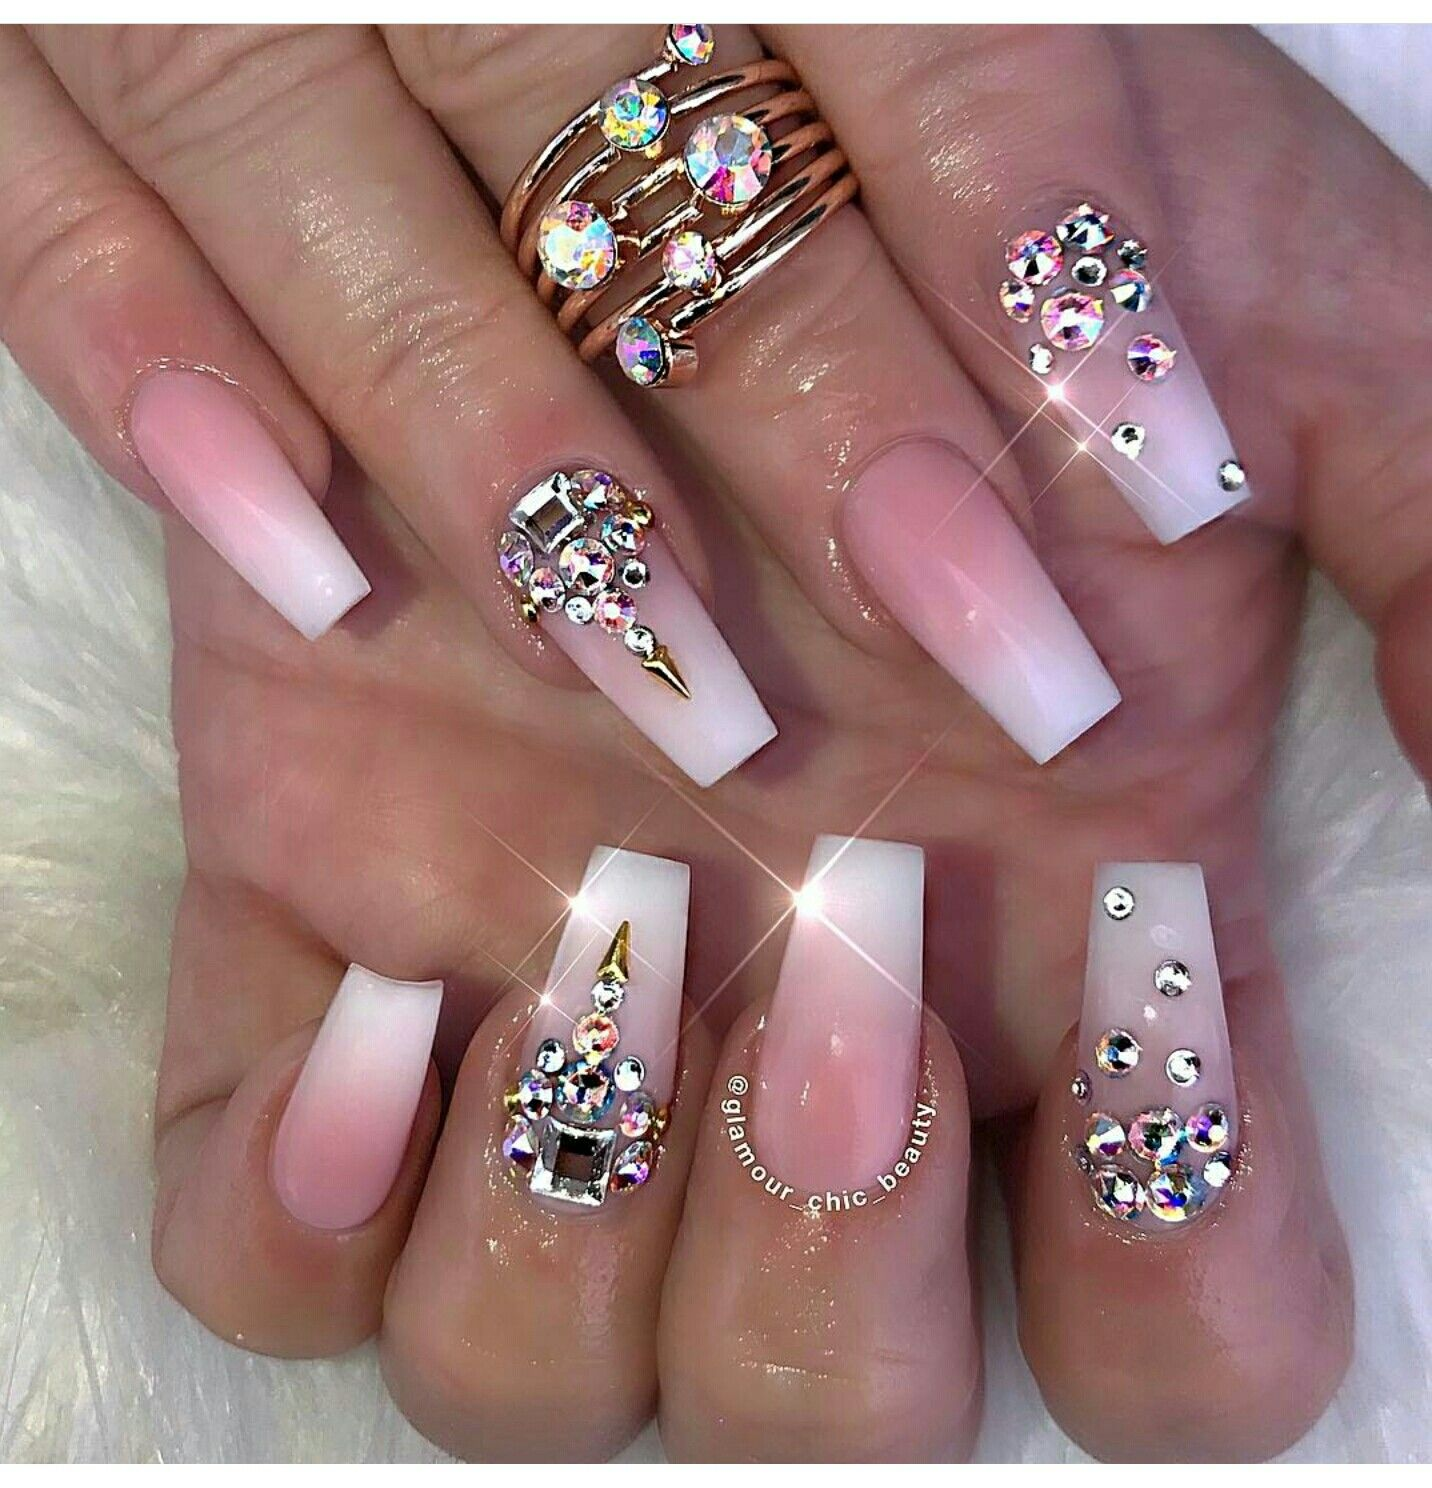 Lilshawtybad| | Womens Classy Stilletos | Pinterest | Nail nail ...